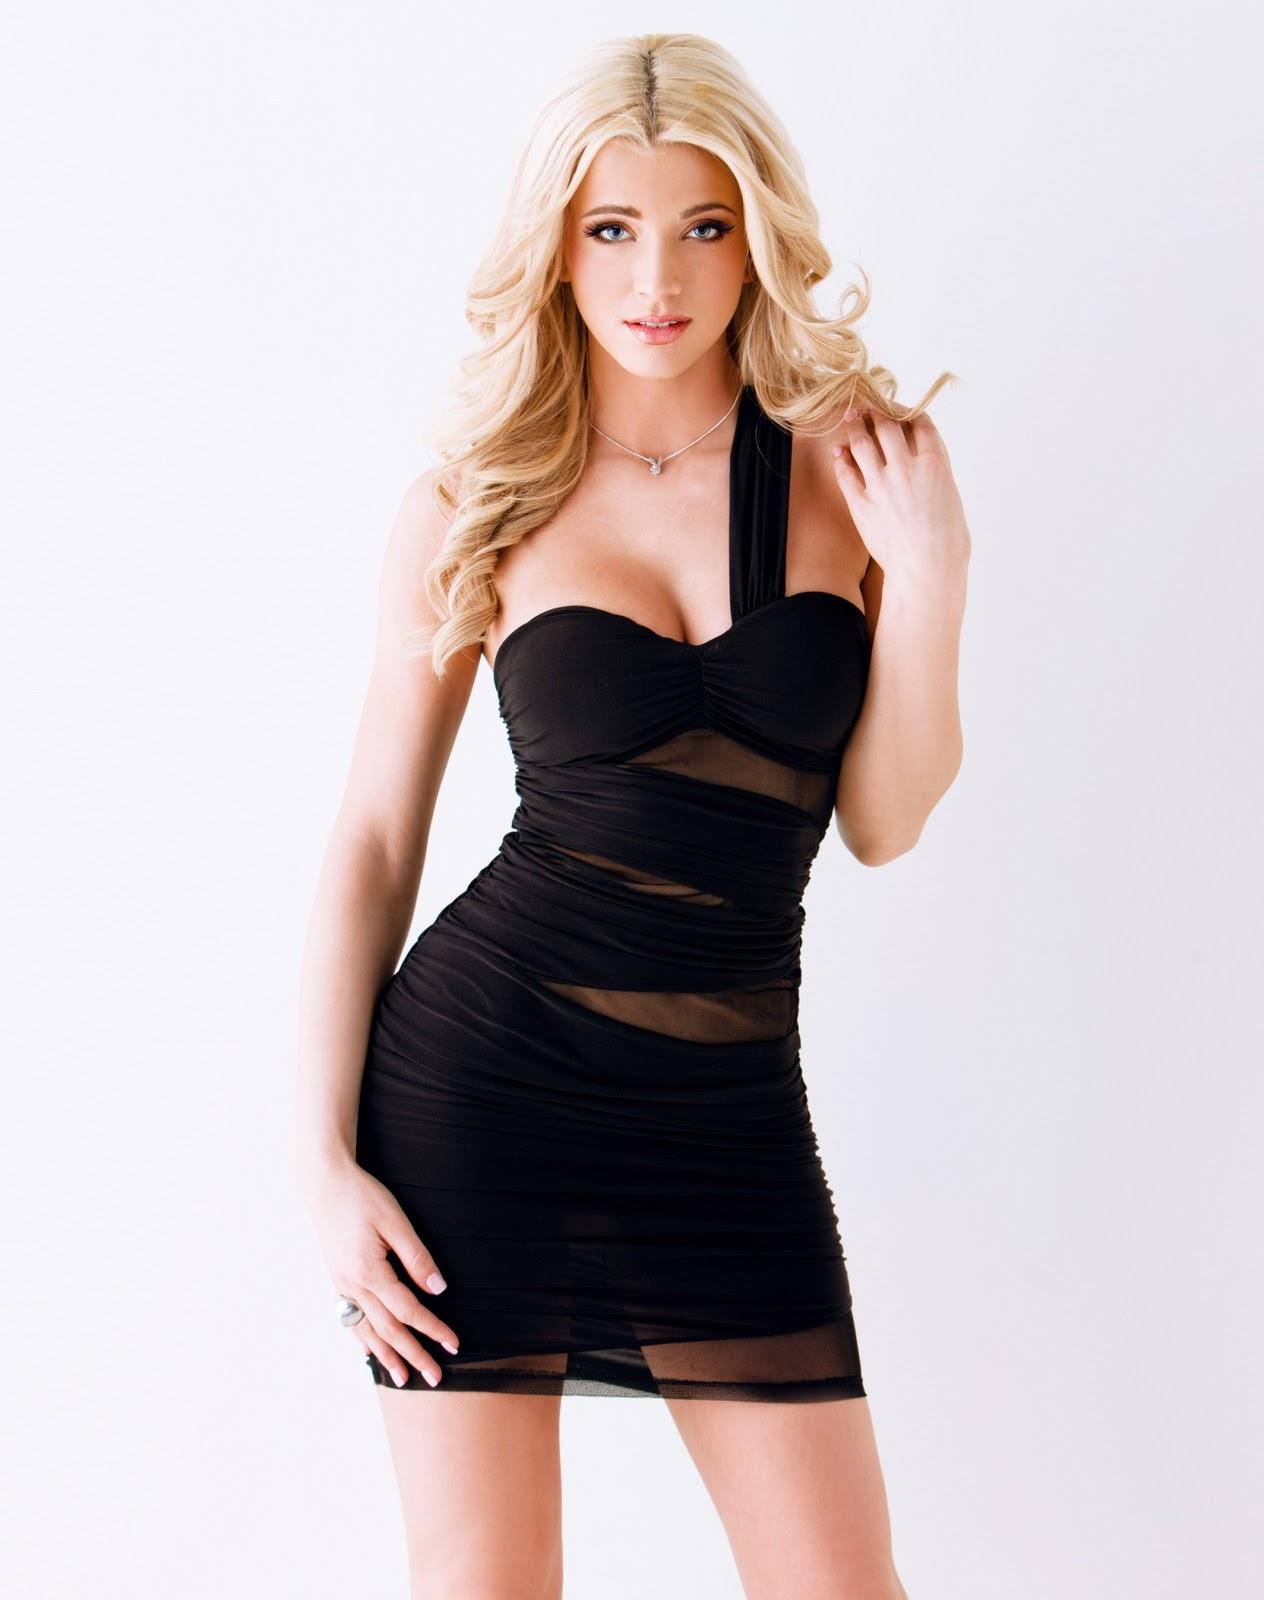 Olivia Paige: Sexy Playboy Girl | Really Ravishing